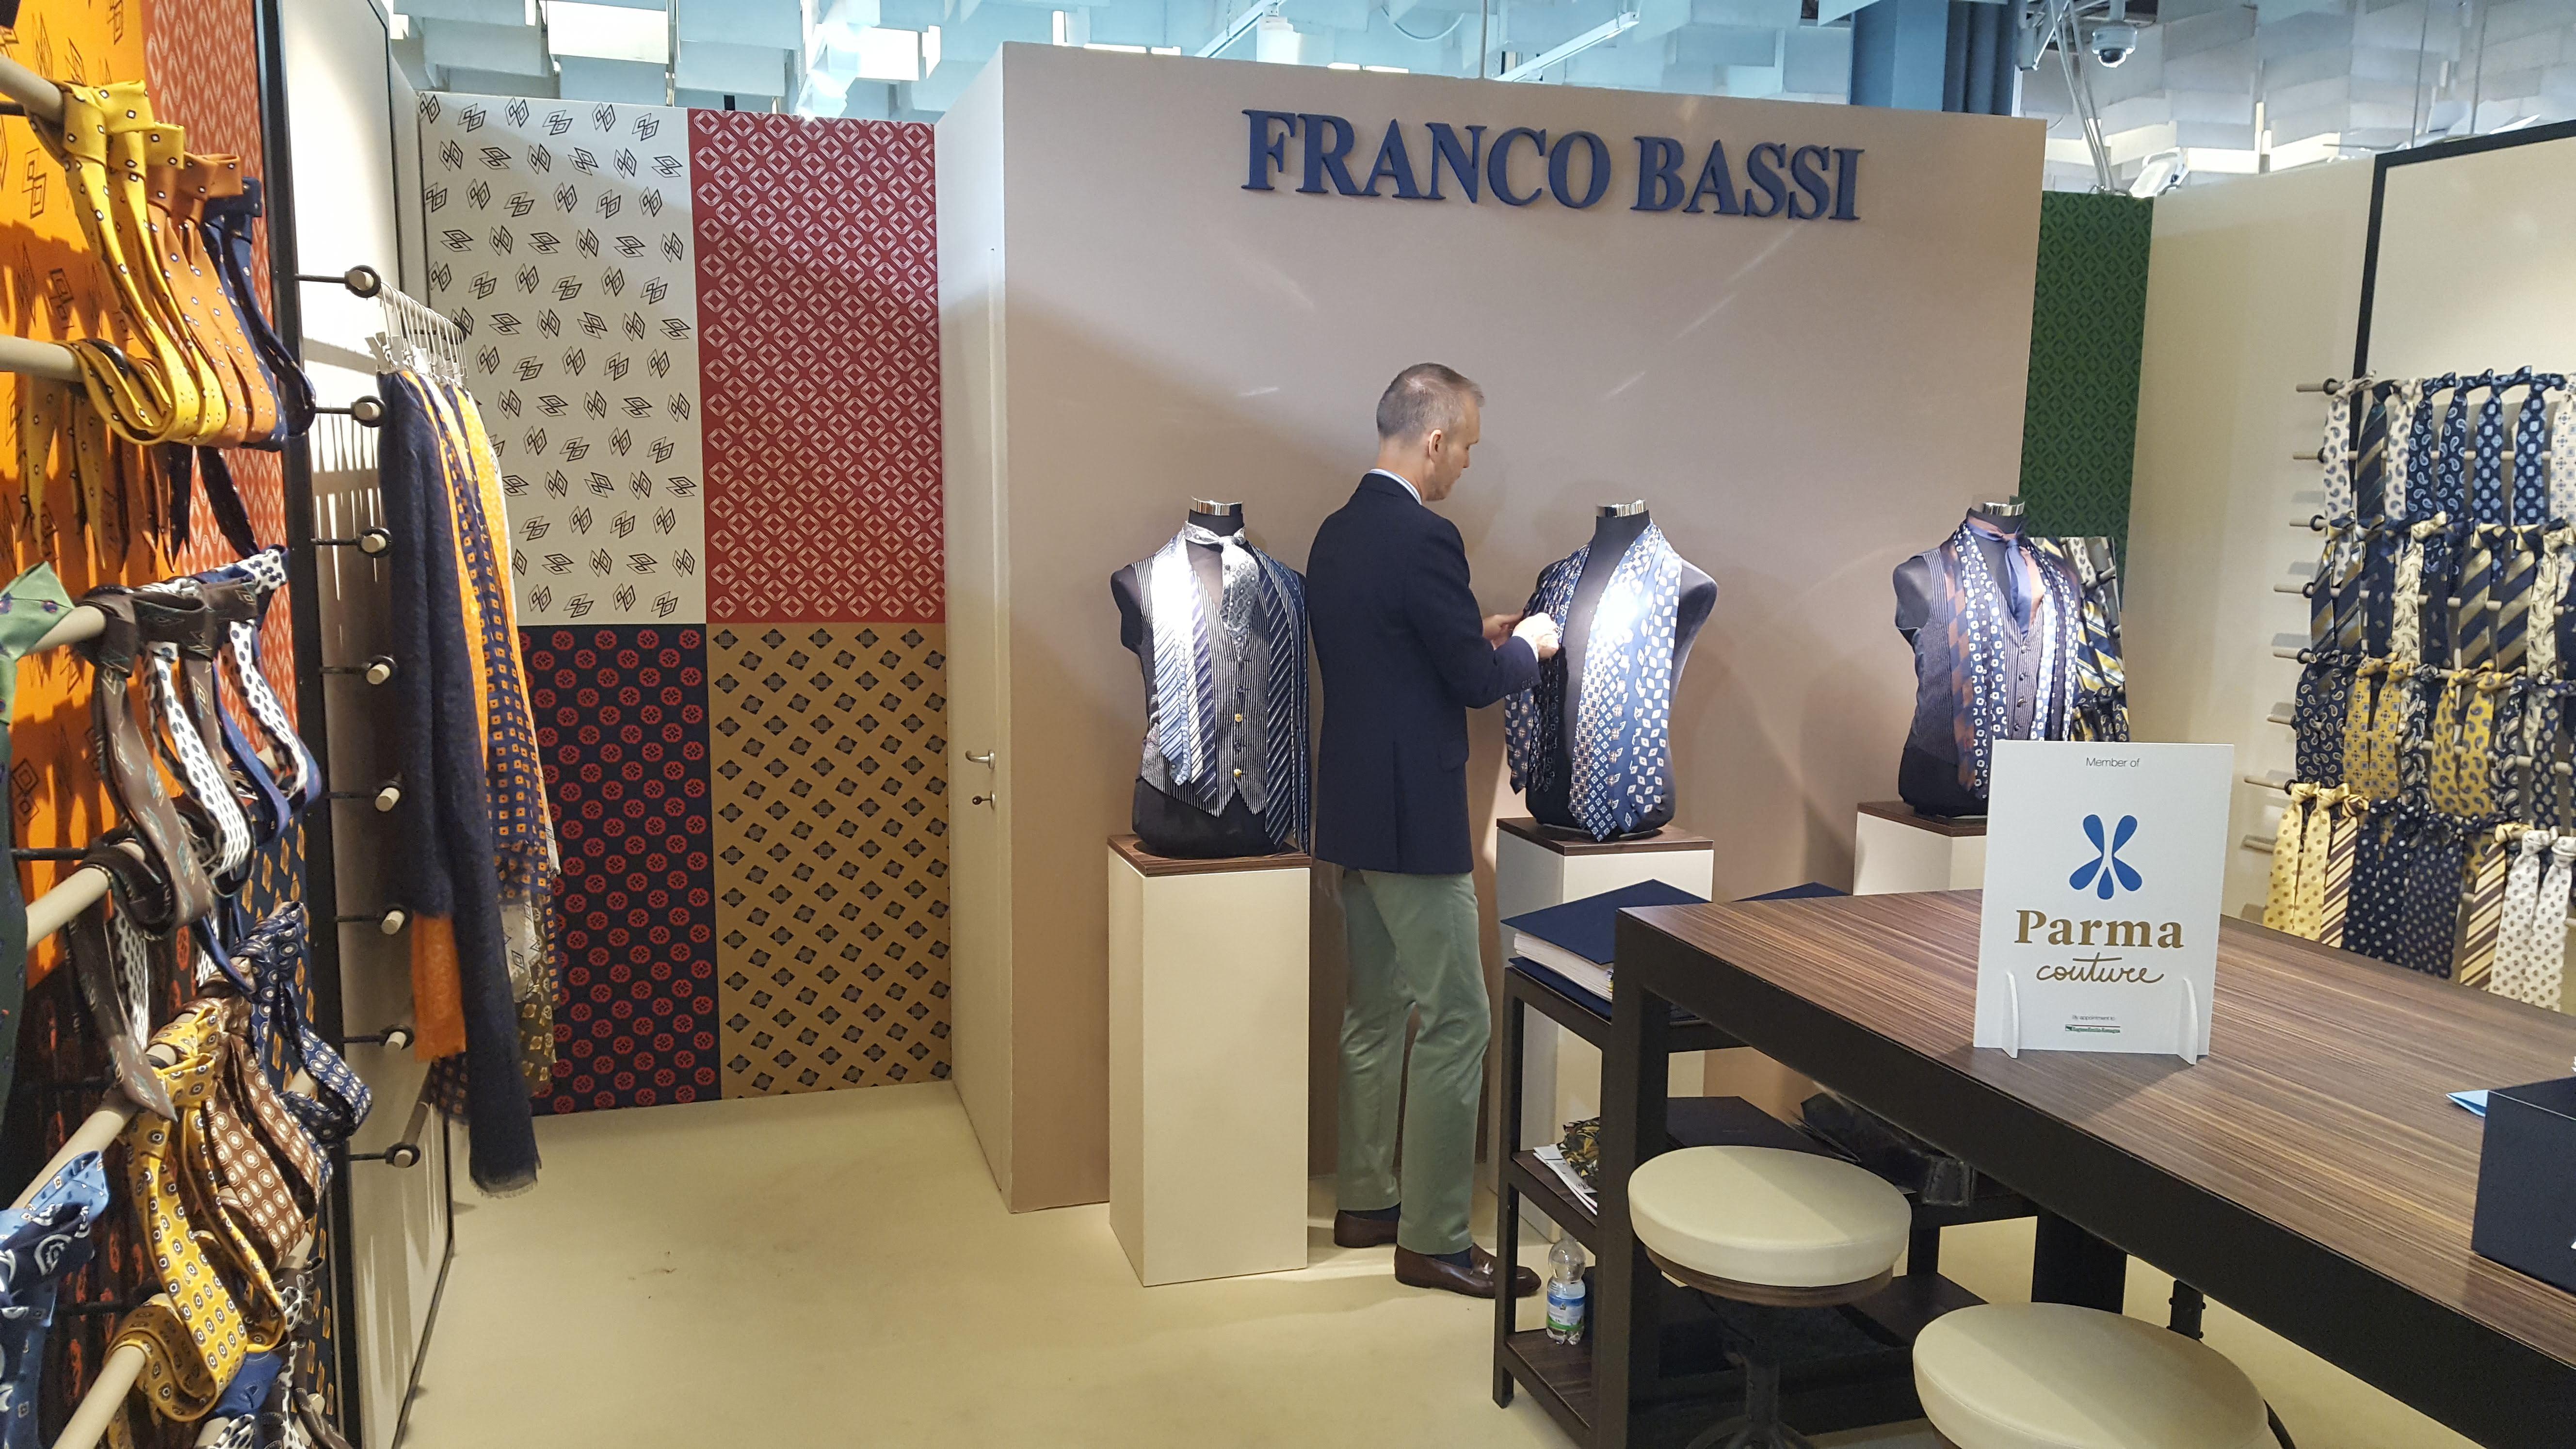 Parma couture bb cravatte srl franco bassi for Bb italia srl